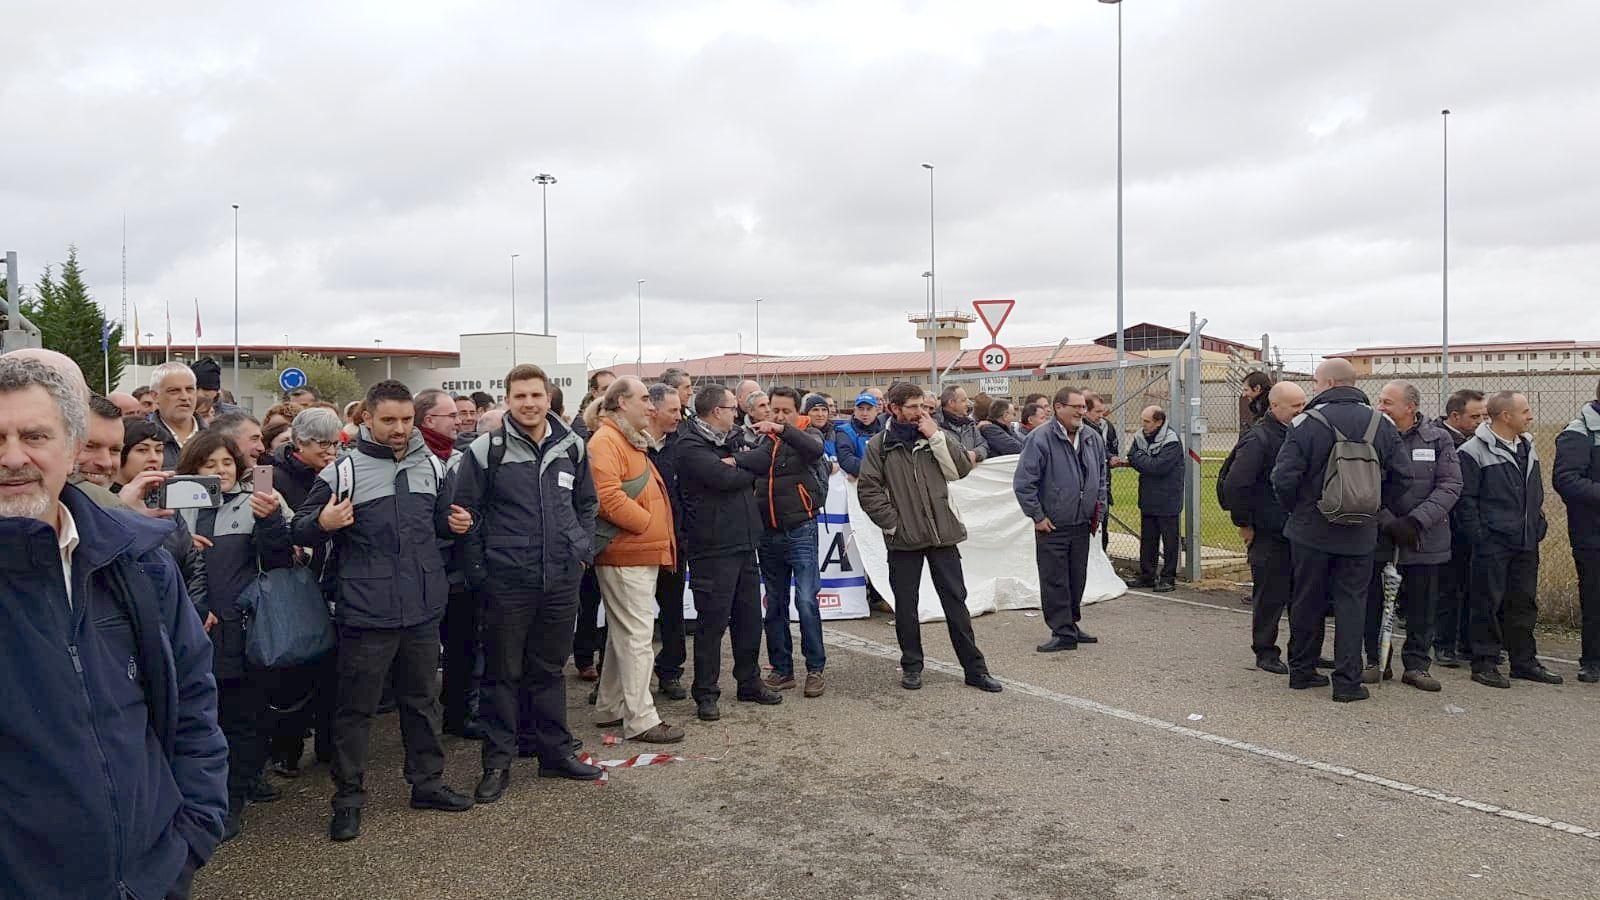 La Guardia Civil desaloja a los funcionarios